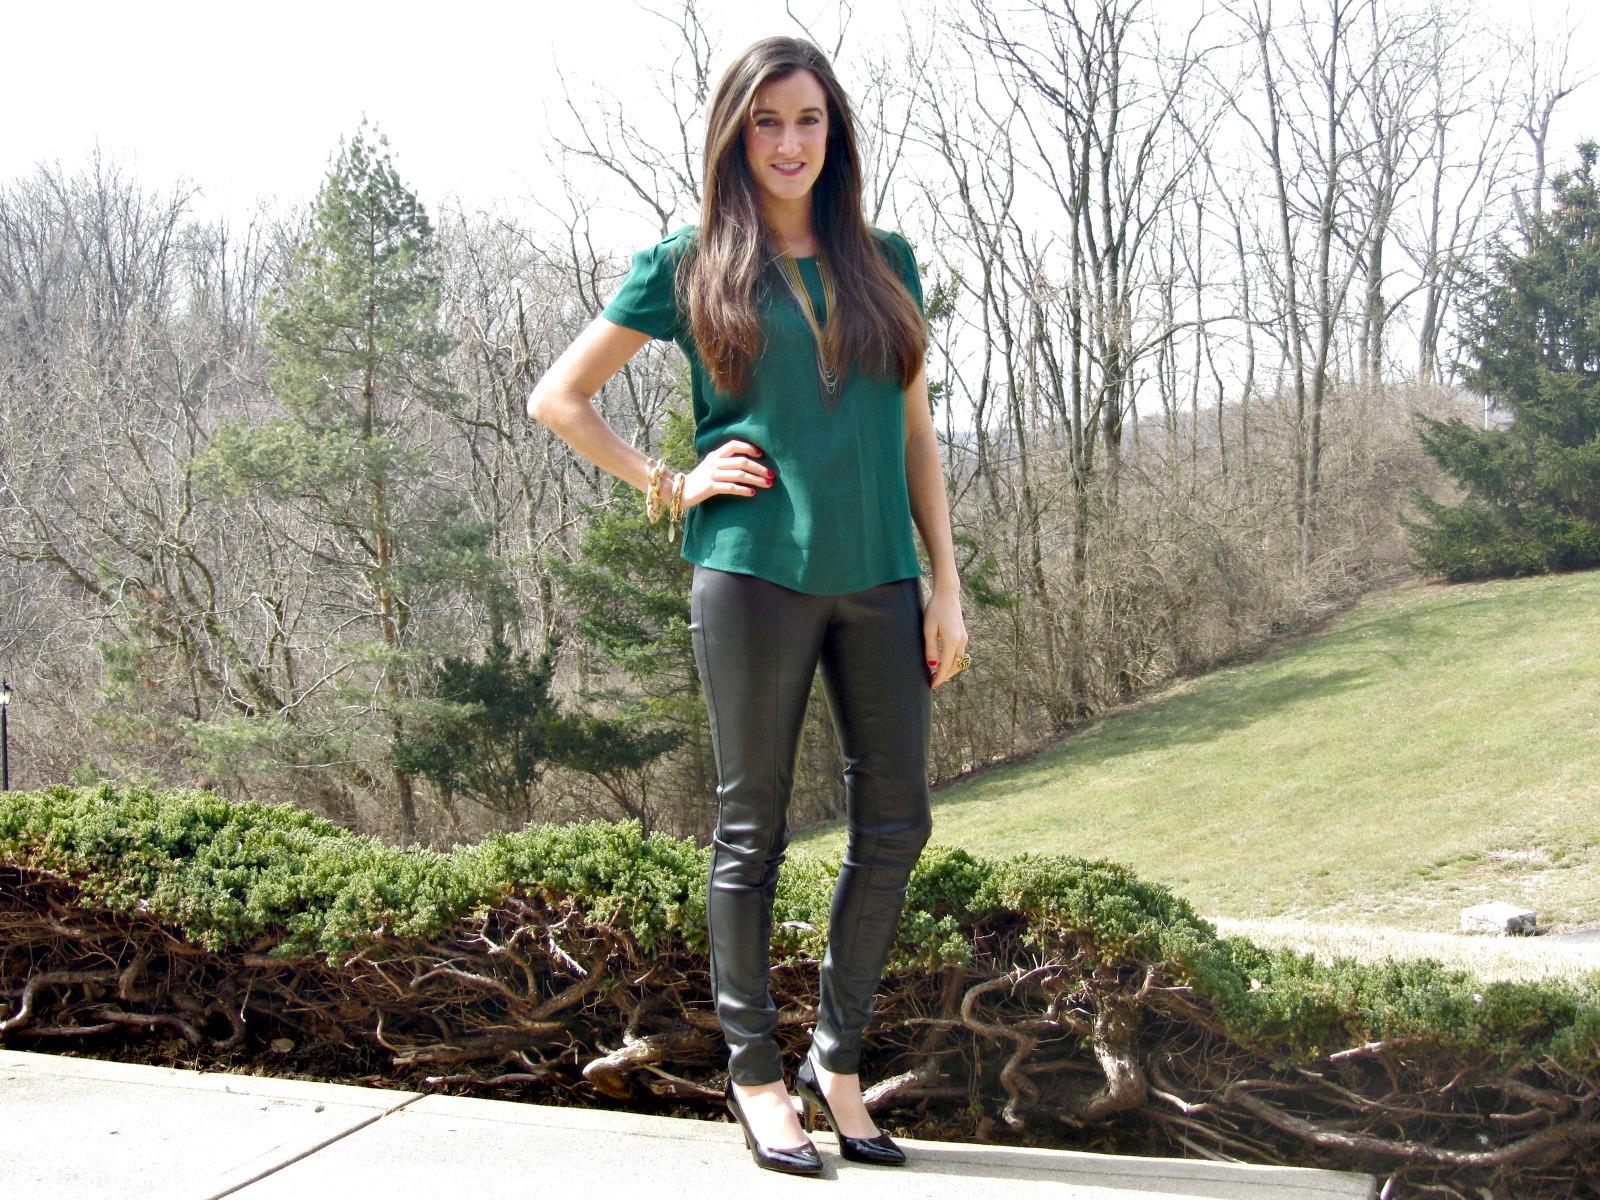 H&M leather pants, Zara green top